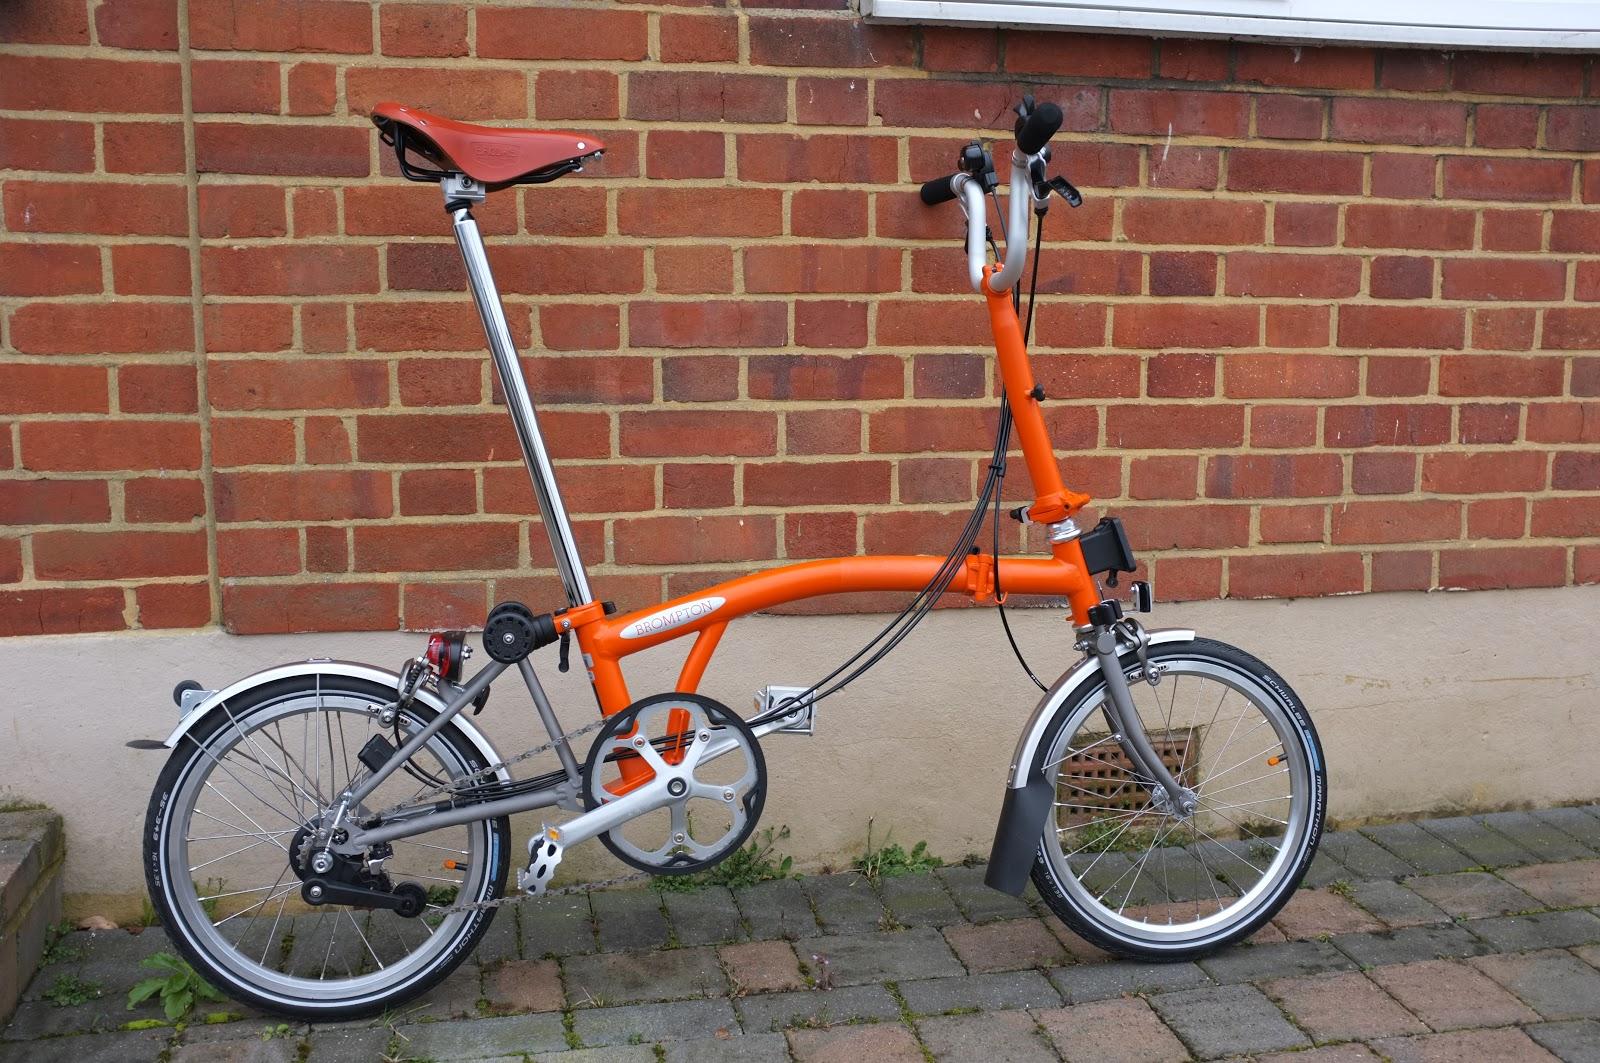 My Orange Brompton Full Review of my Titanium Orange Brompton